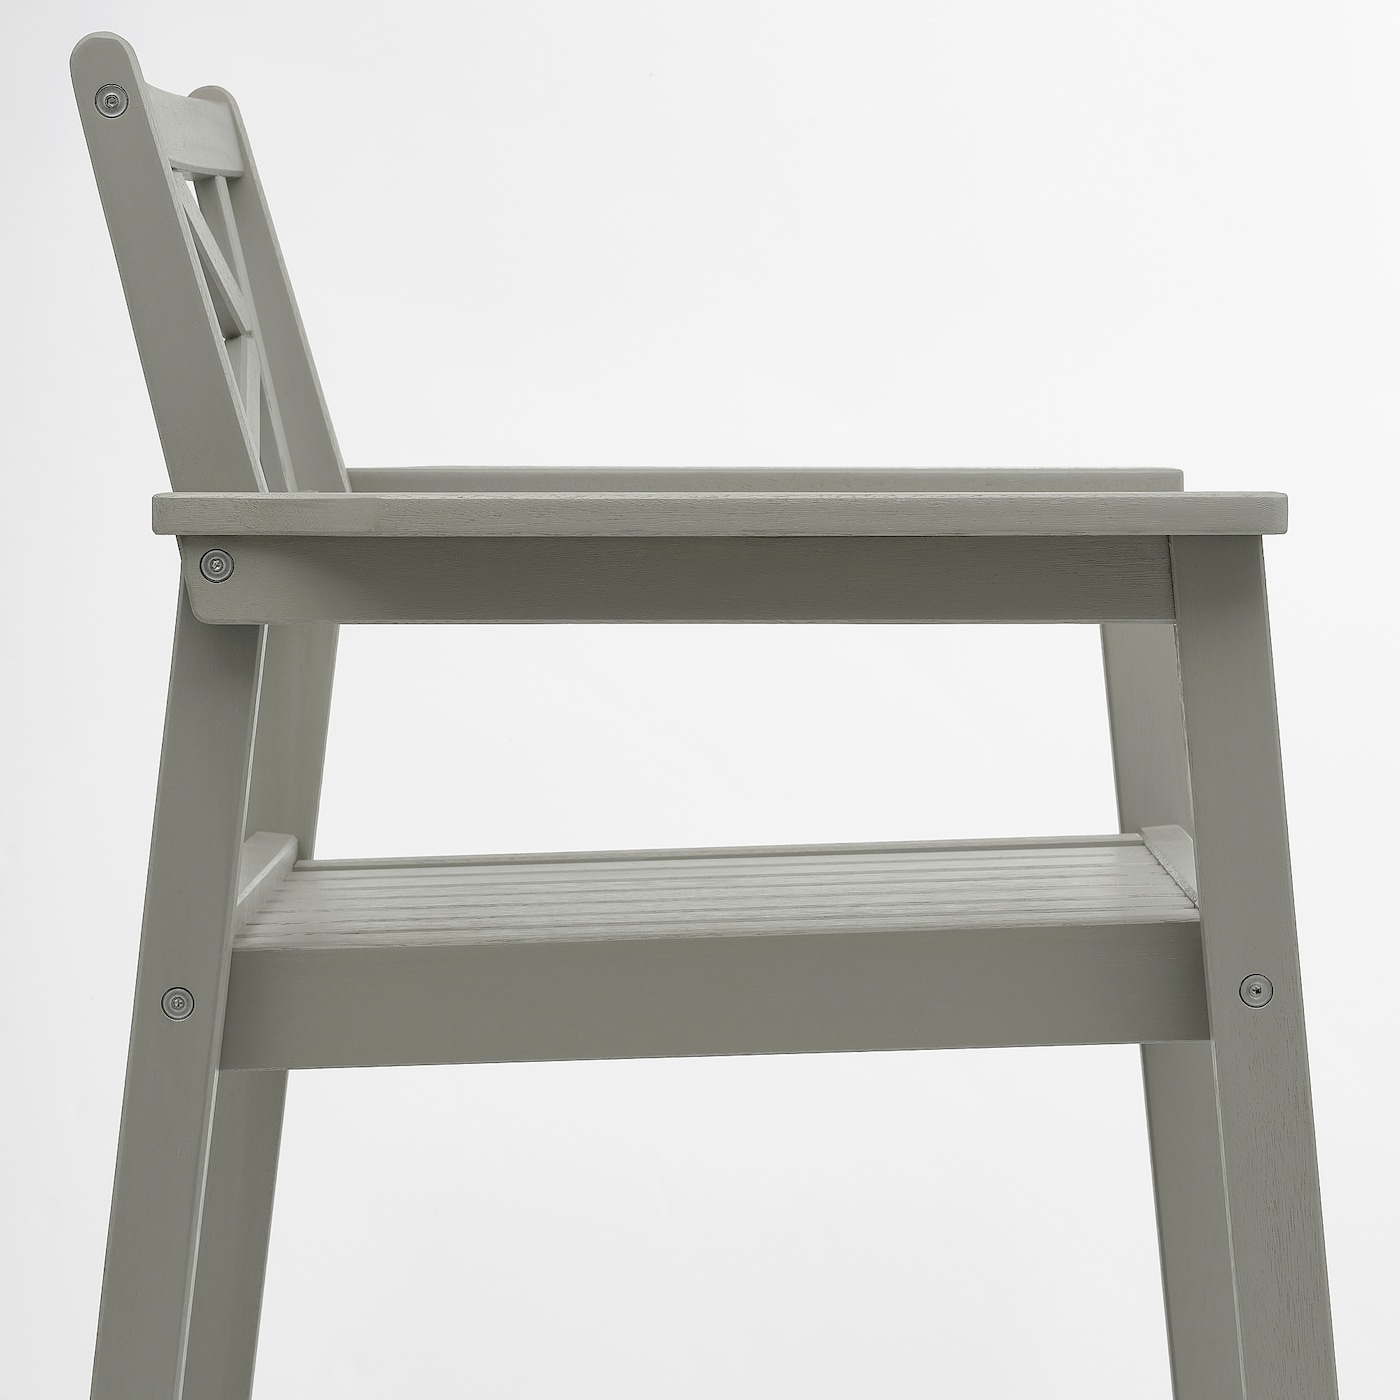 BONDHOLMEN Bord + 6 stoler m armlener, utend, gråbeiset/Kuddarna beige